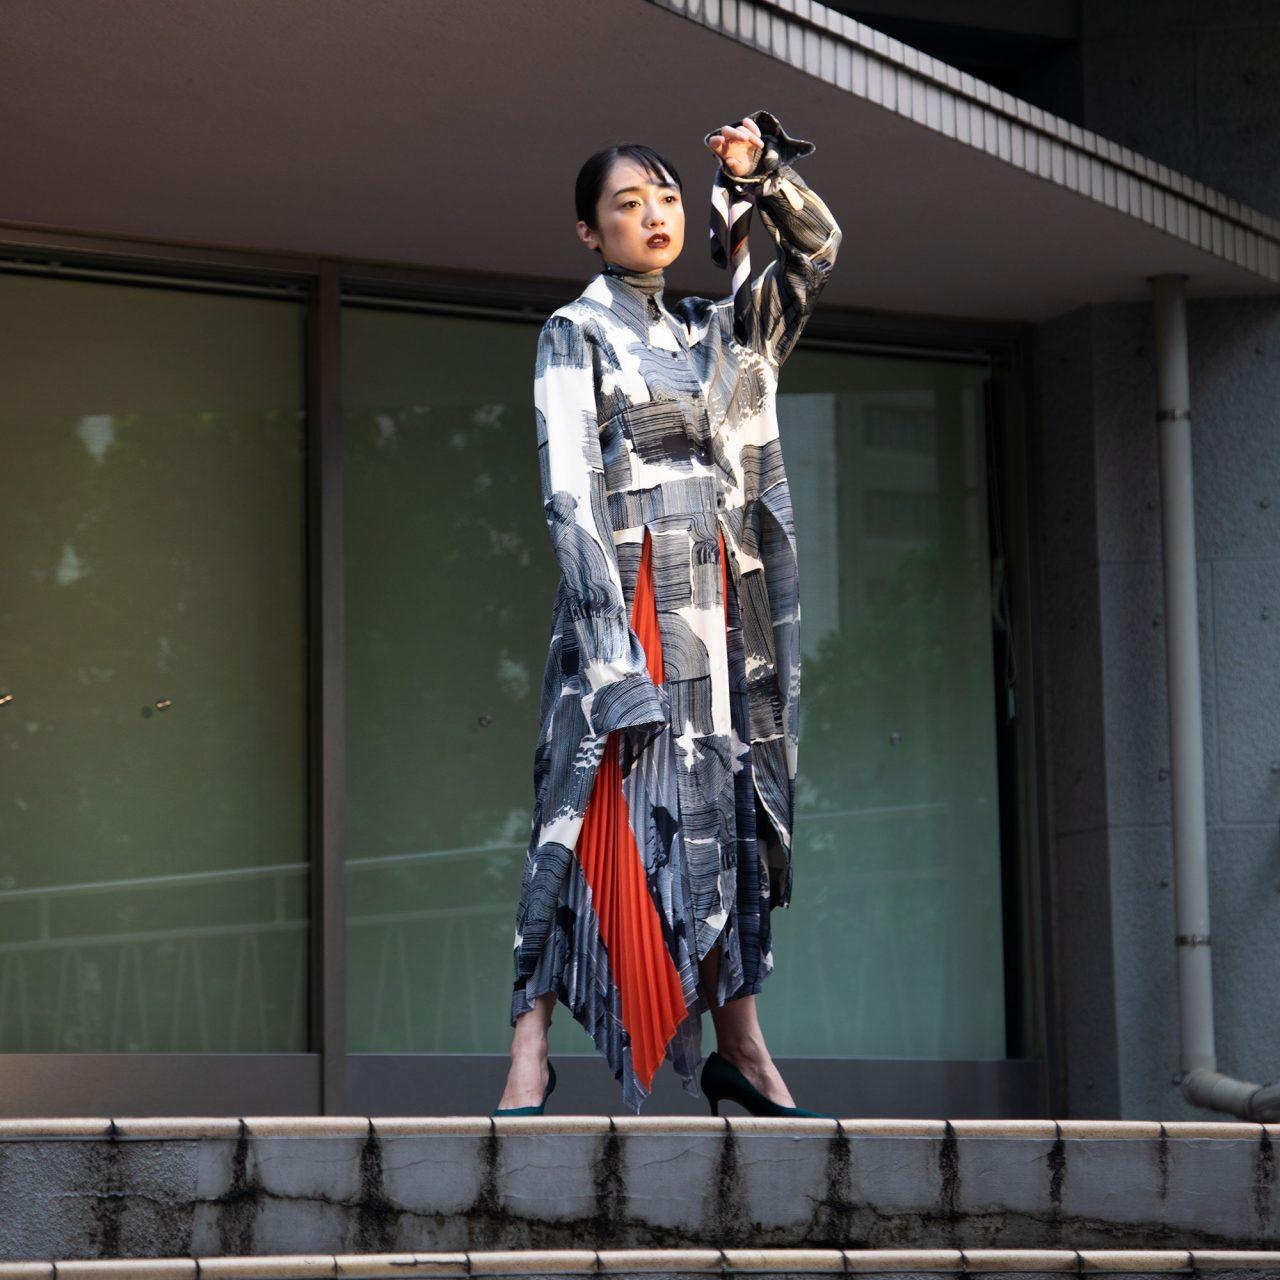 ©︎ Kiyotaka Hamamura